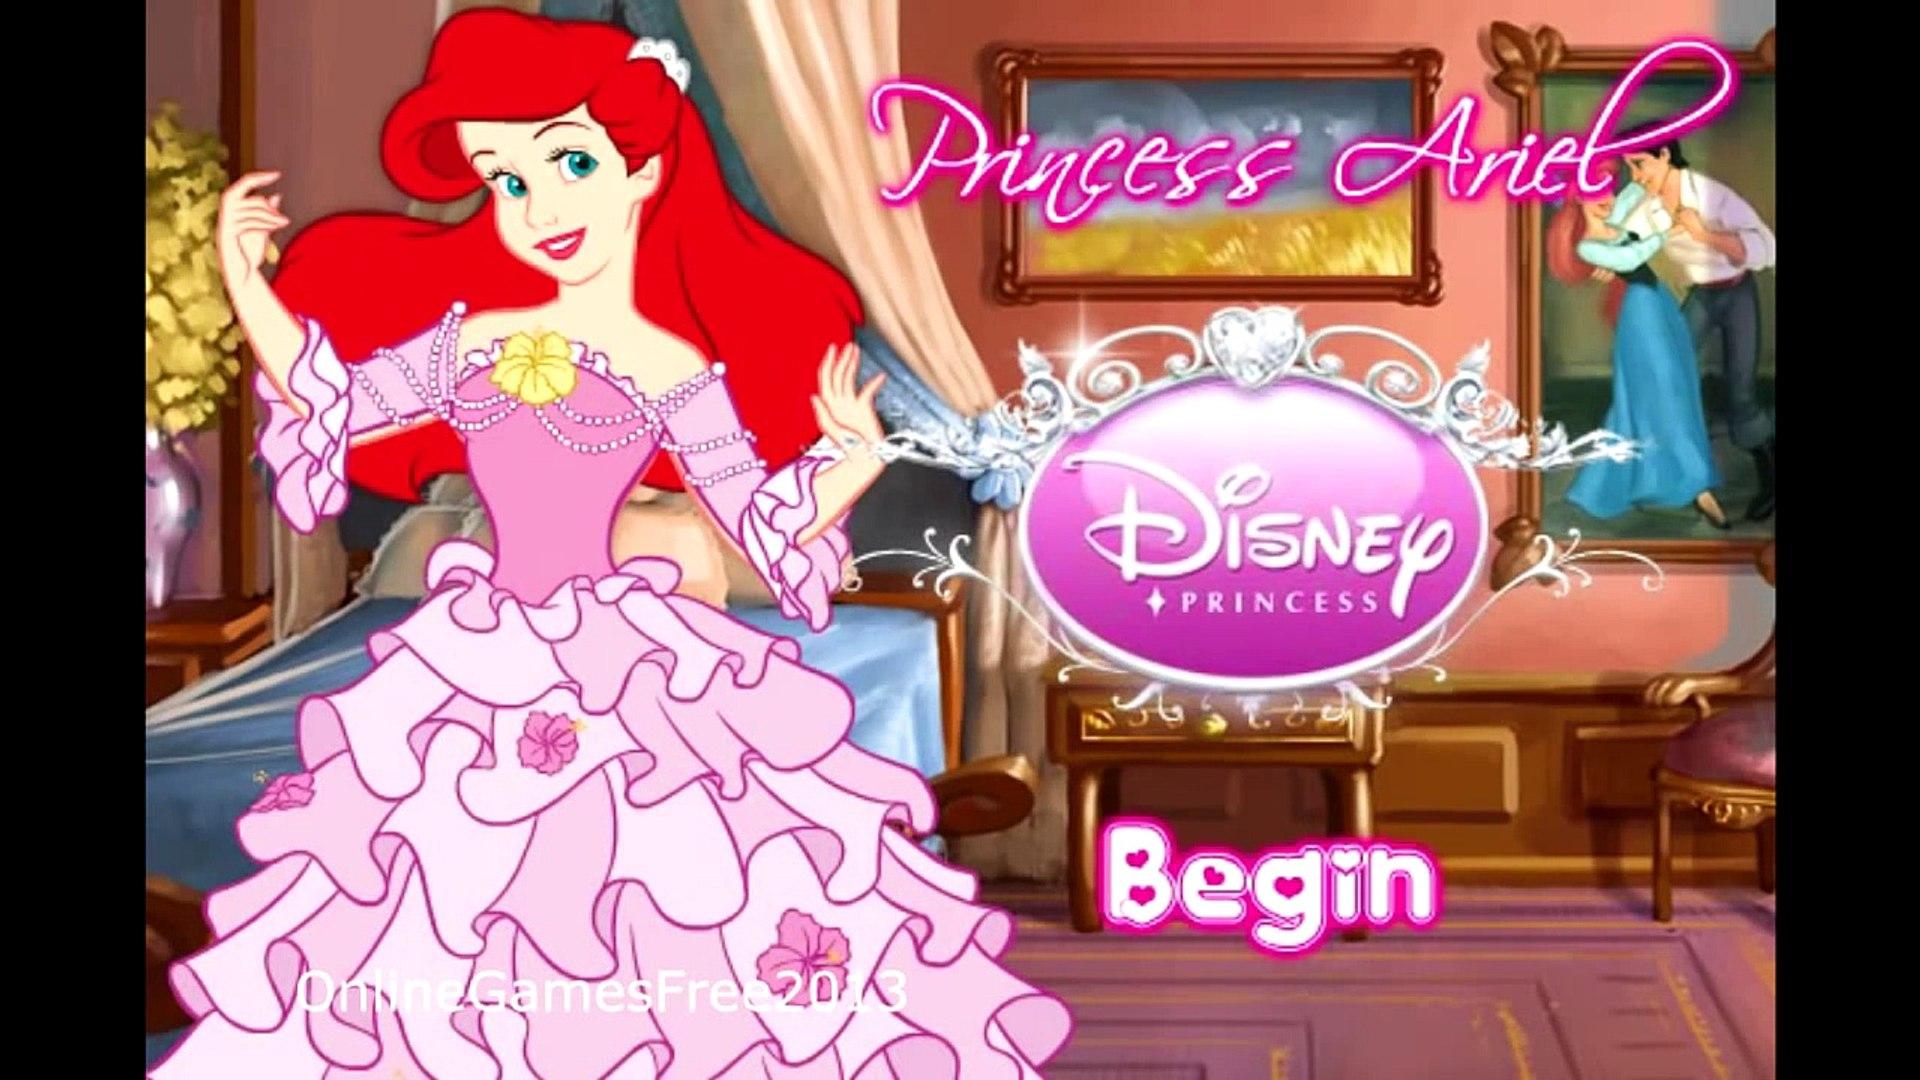 Disney Princess Dress Up Games